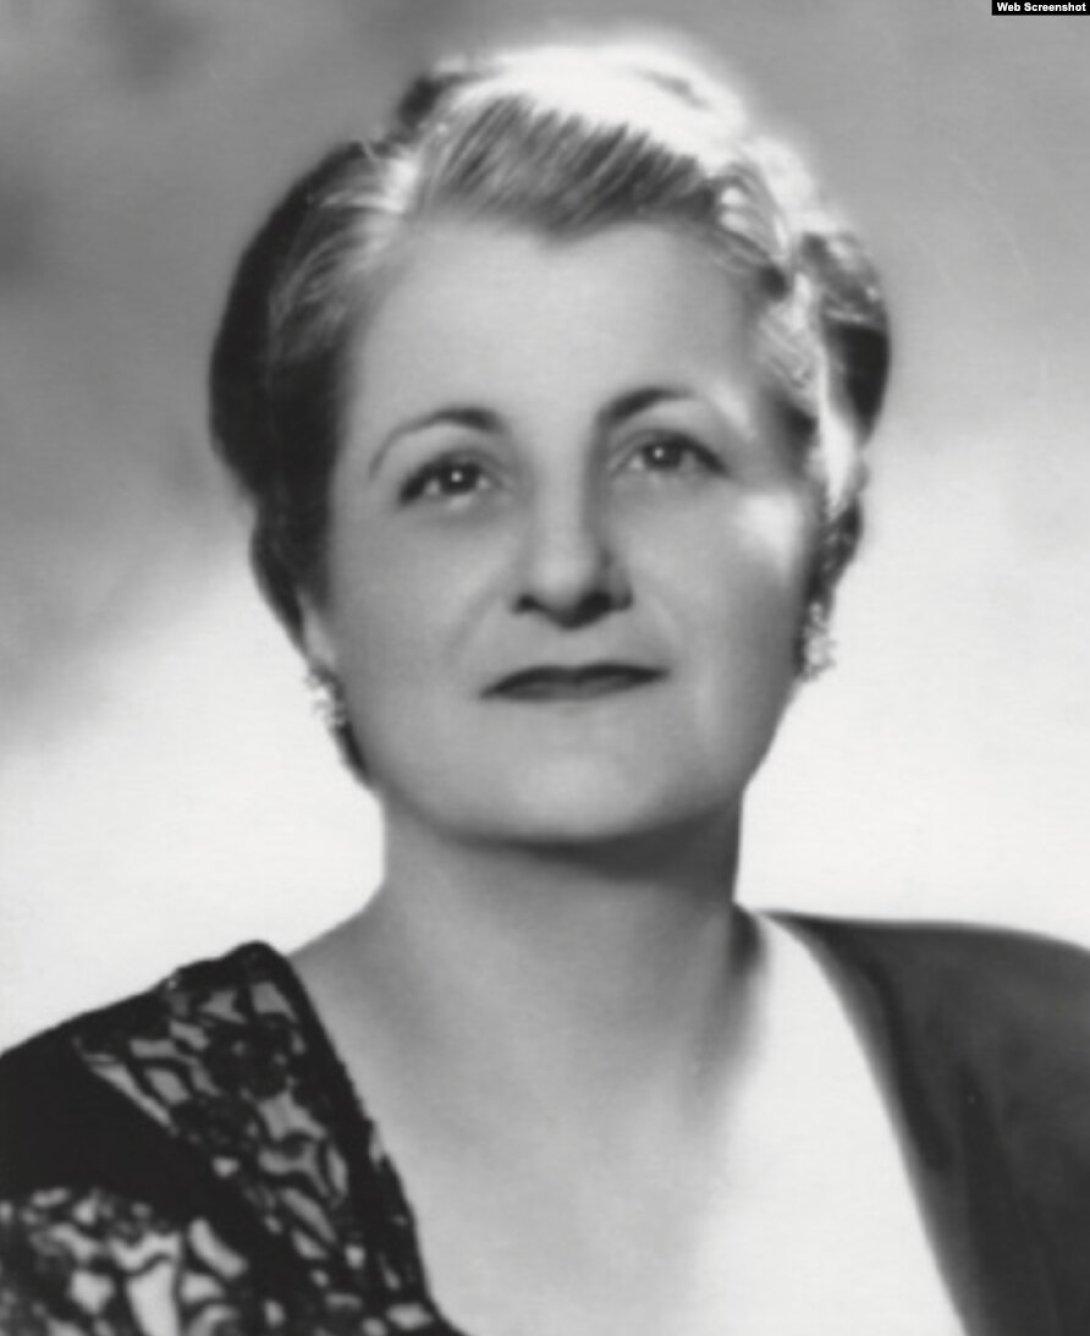 Ana María Rodríguez de Gutiérrez